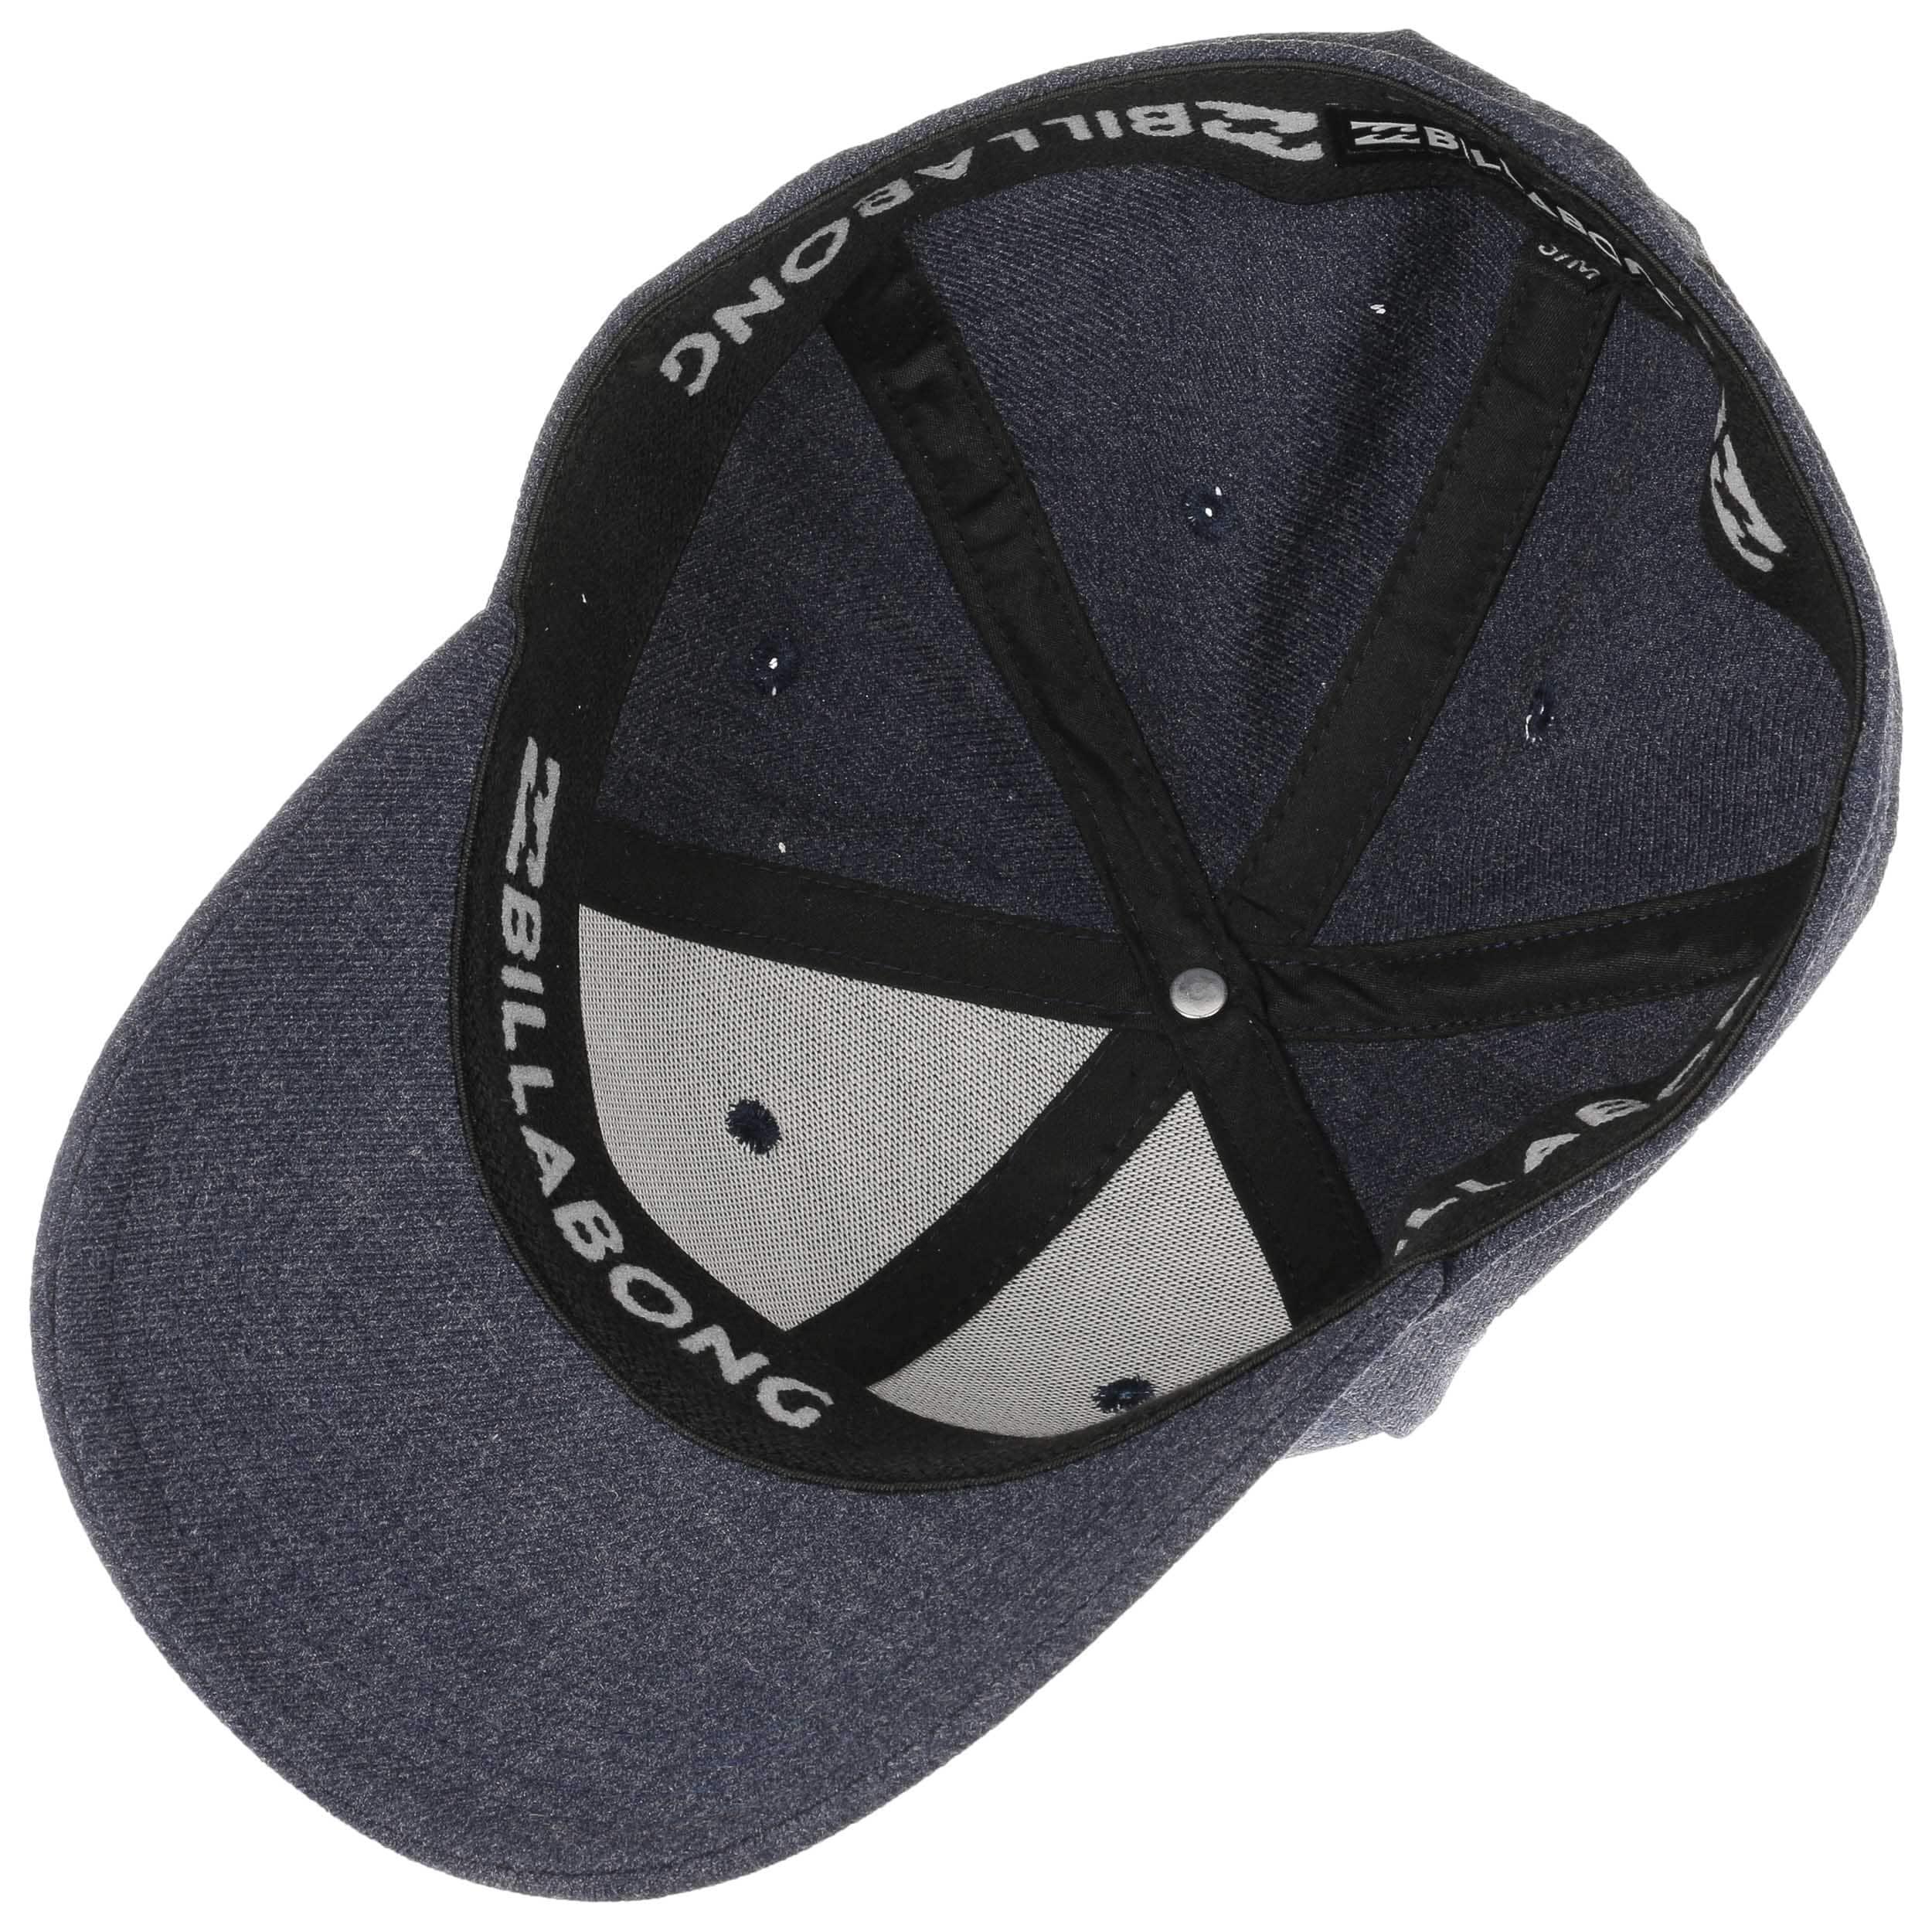 ce9a1fa1b5db1 ireland billabong flexfit hat a72e0 569b2